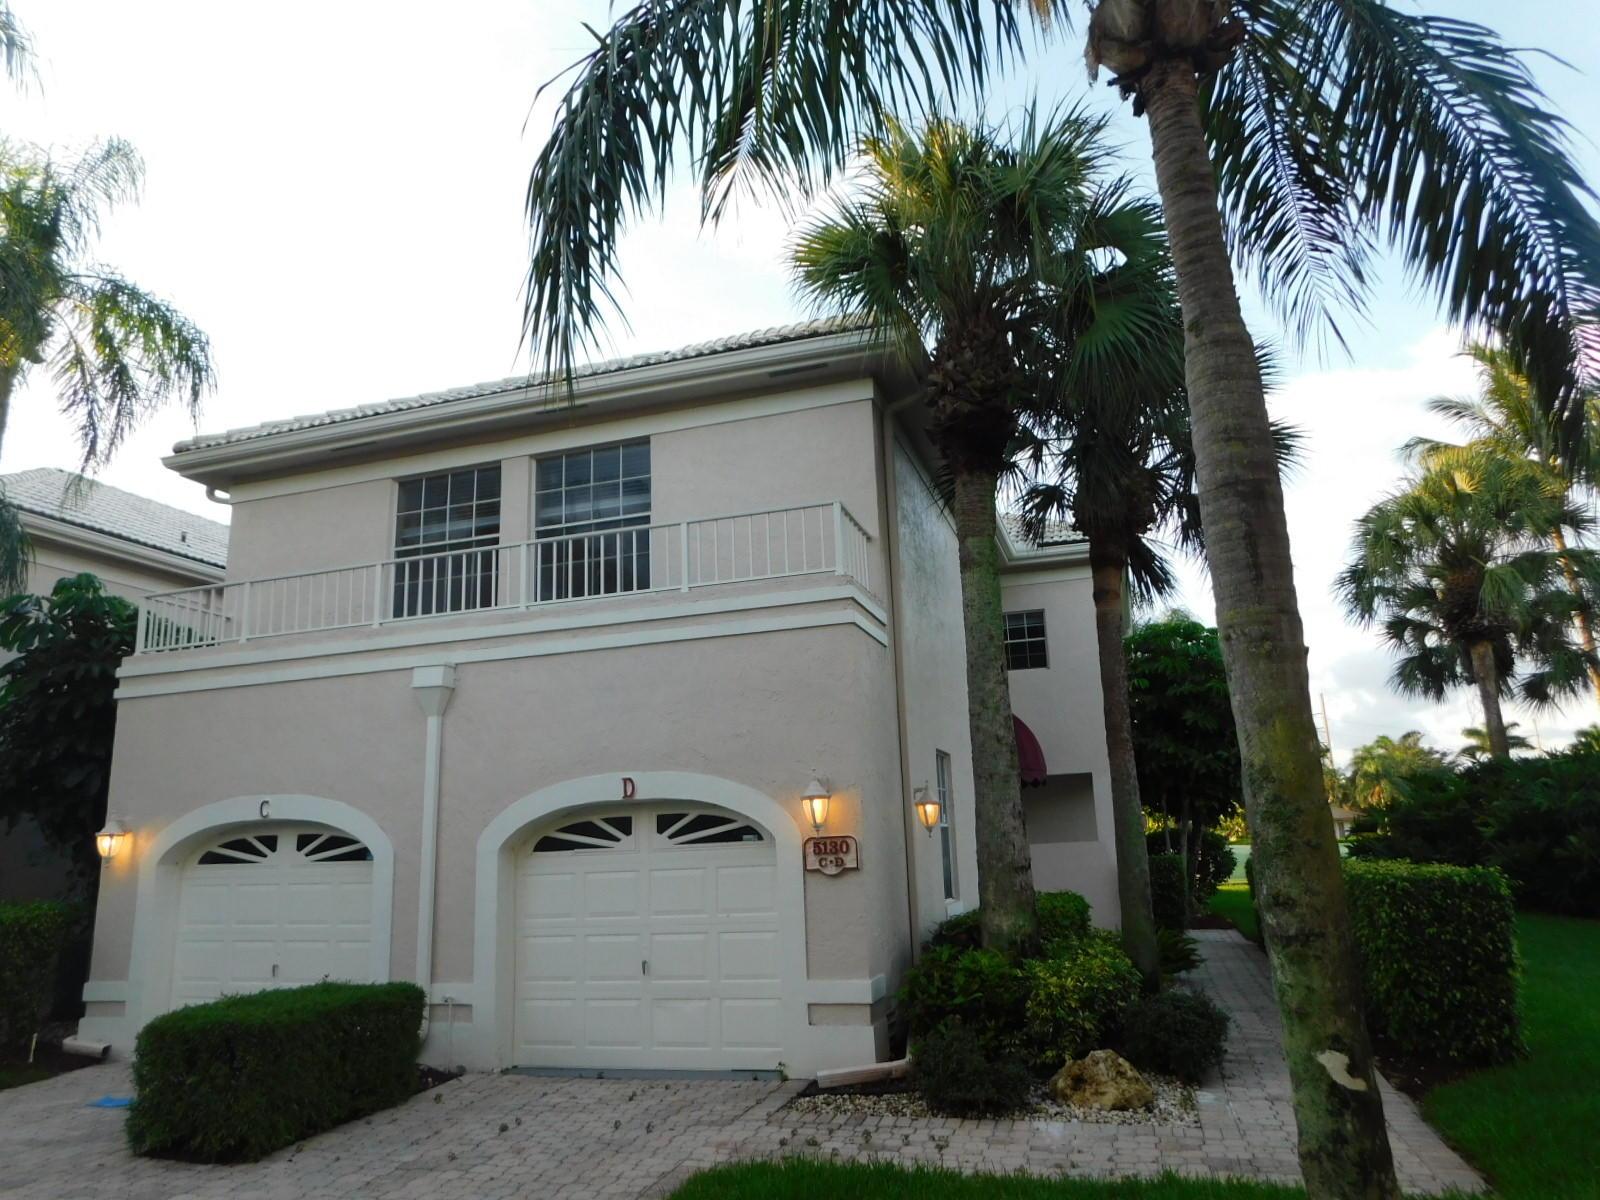 5130 Lake Catalina Drive, Boca Raton, Florida 33496, 3 Bedrooms Bedrooms, ,2.1 BathroomsBathrooms,Condo/Coop,For Sale,Lake Catalina,2,RX-10451342